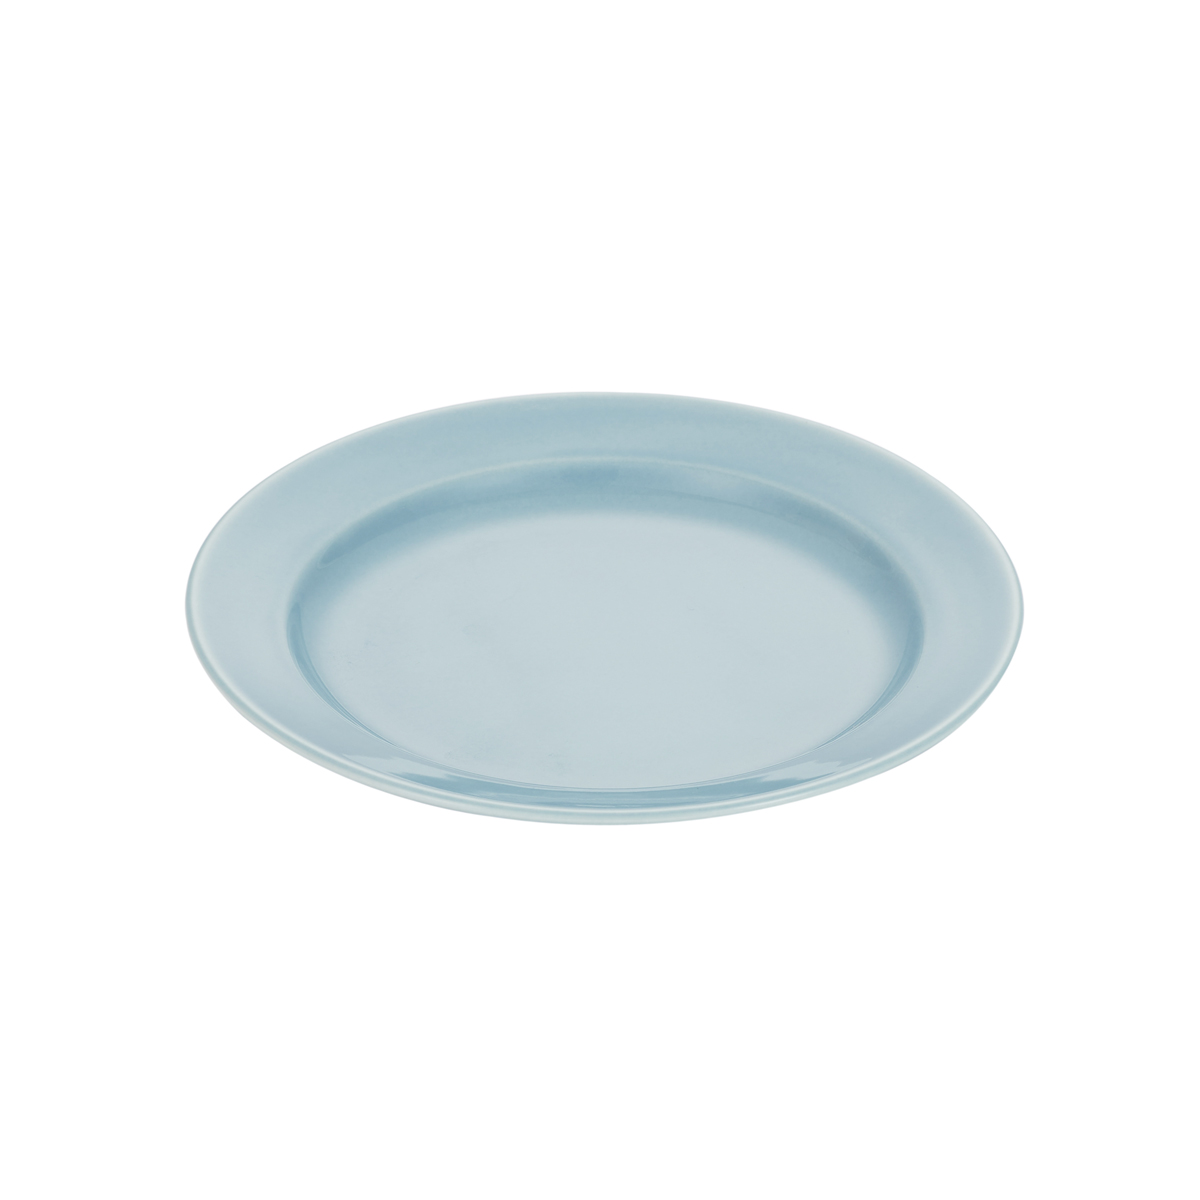 Тарелка мелкая GIPFEL PRINCESSE 50790 17,5см